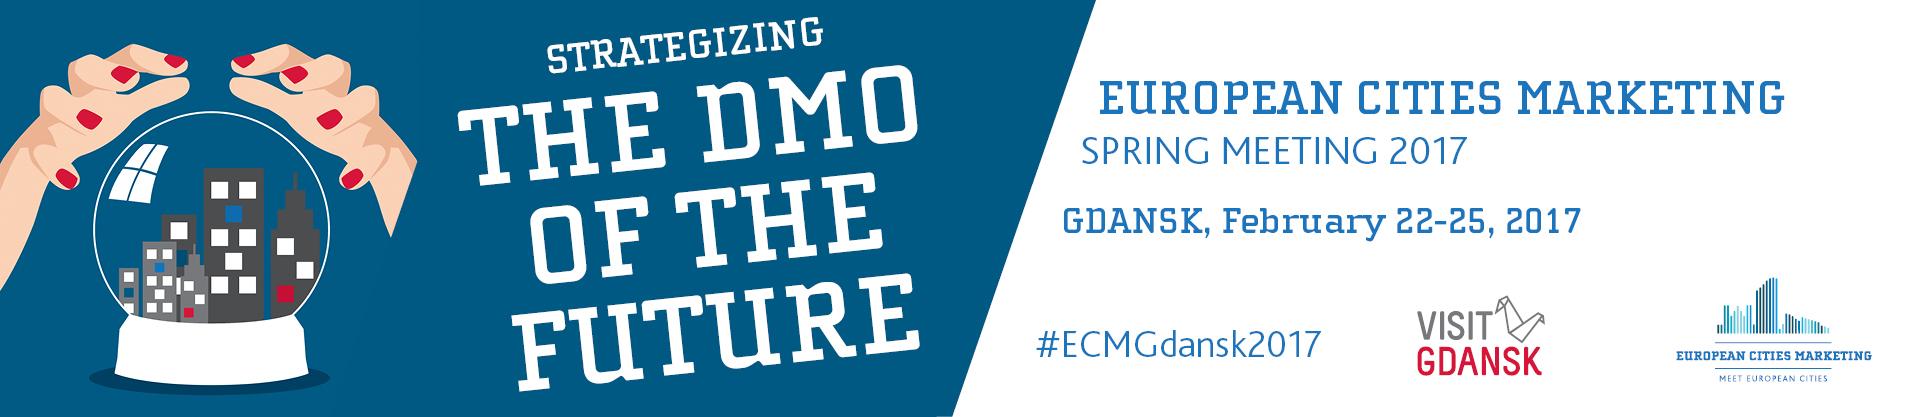 Banner ECM Spring Meeting Gdansk 2017 Cvent